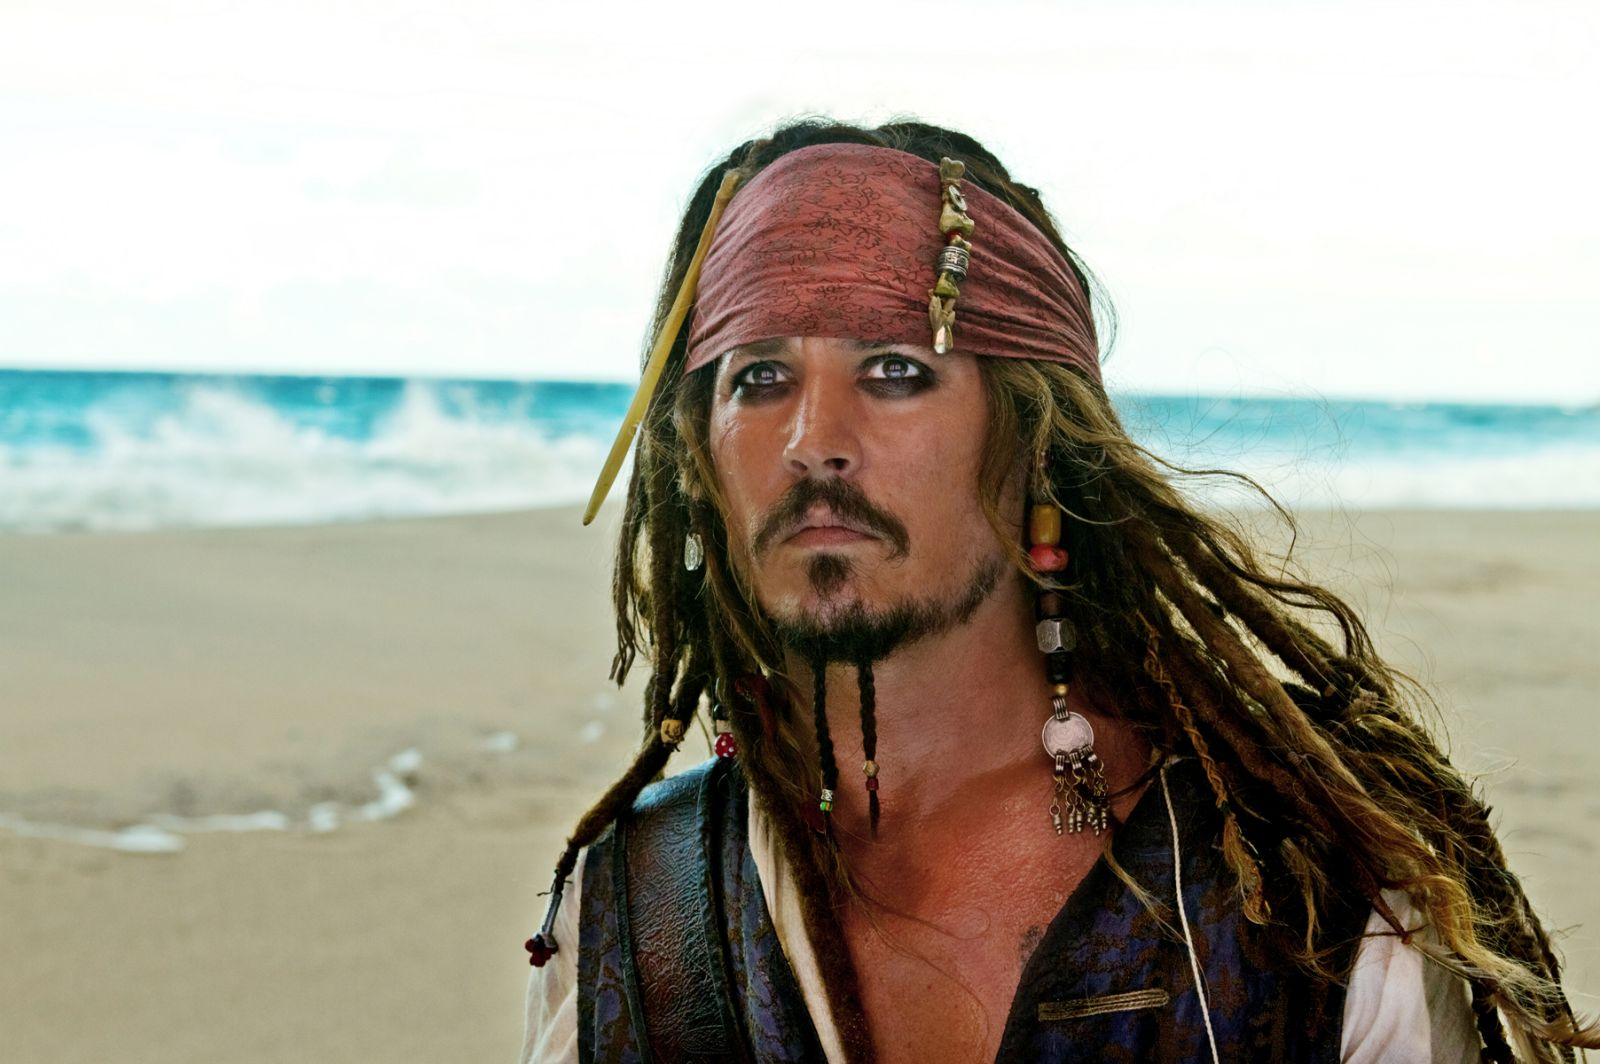 http://4.bp.blogspot.com/-EW_CUtKeQpw/TcdSrbIhLyI/AAAAAAAAYfI/LtXT4OWbzNw/s1600/2011_pirates_of_the_caribbean_on_stranger_tides_028.jpg